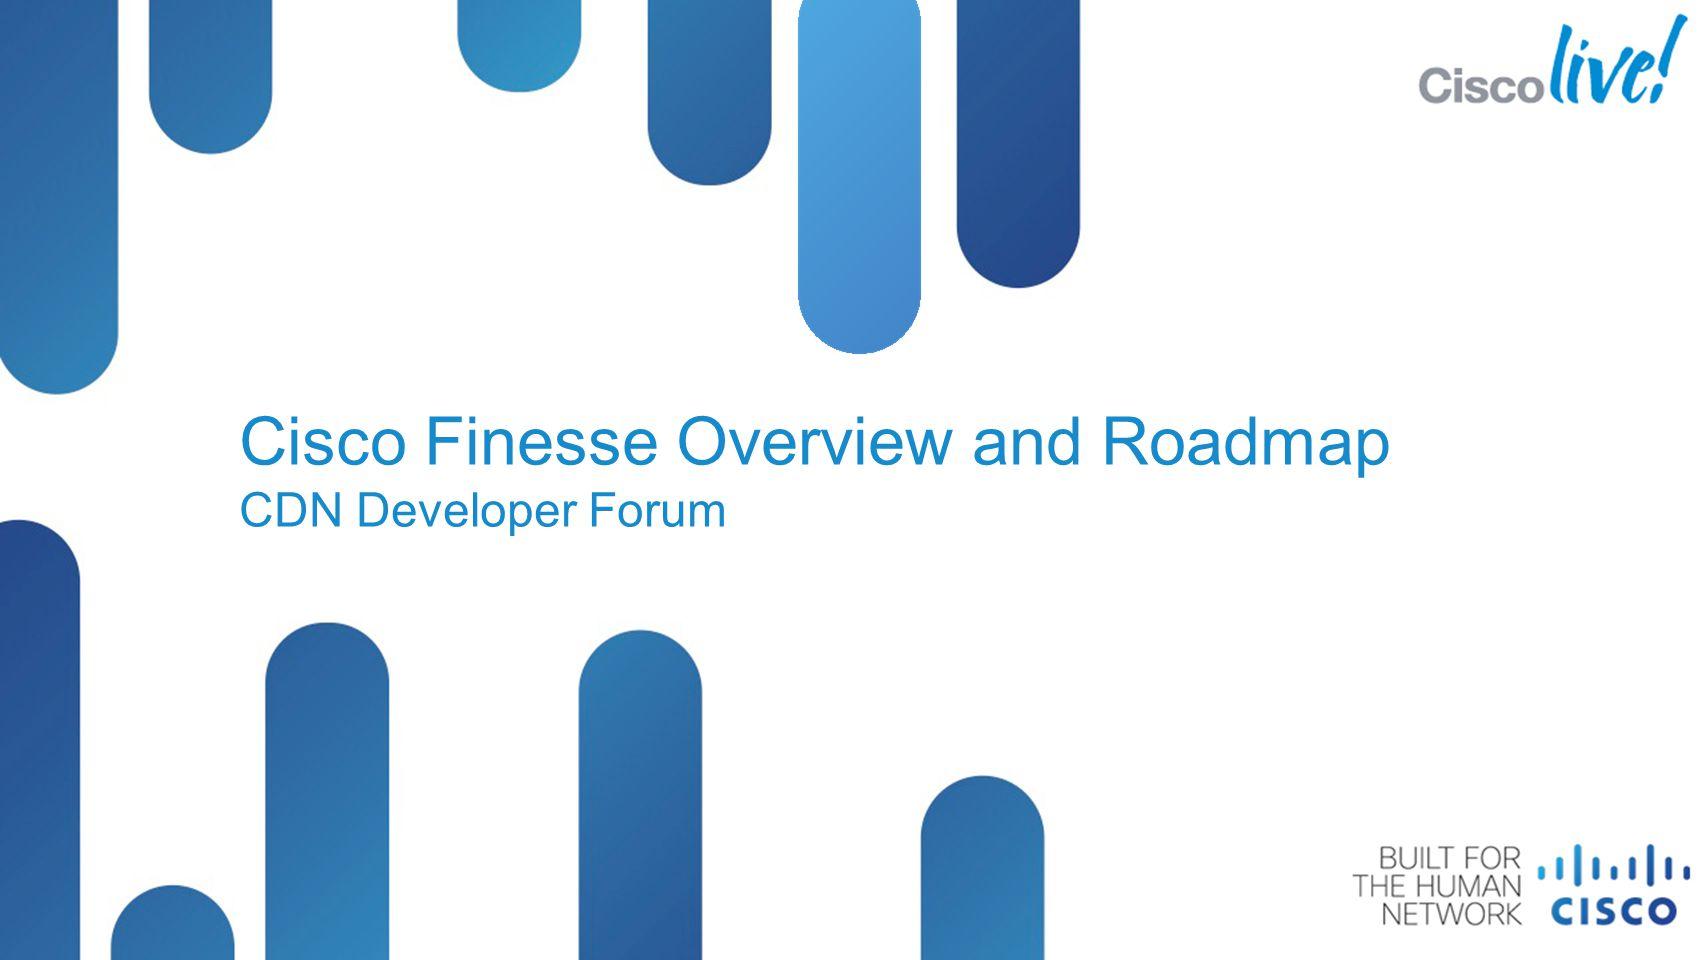 Cisco Finesse Overview and Roadmap CDN Developer Forum